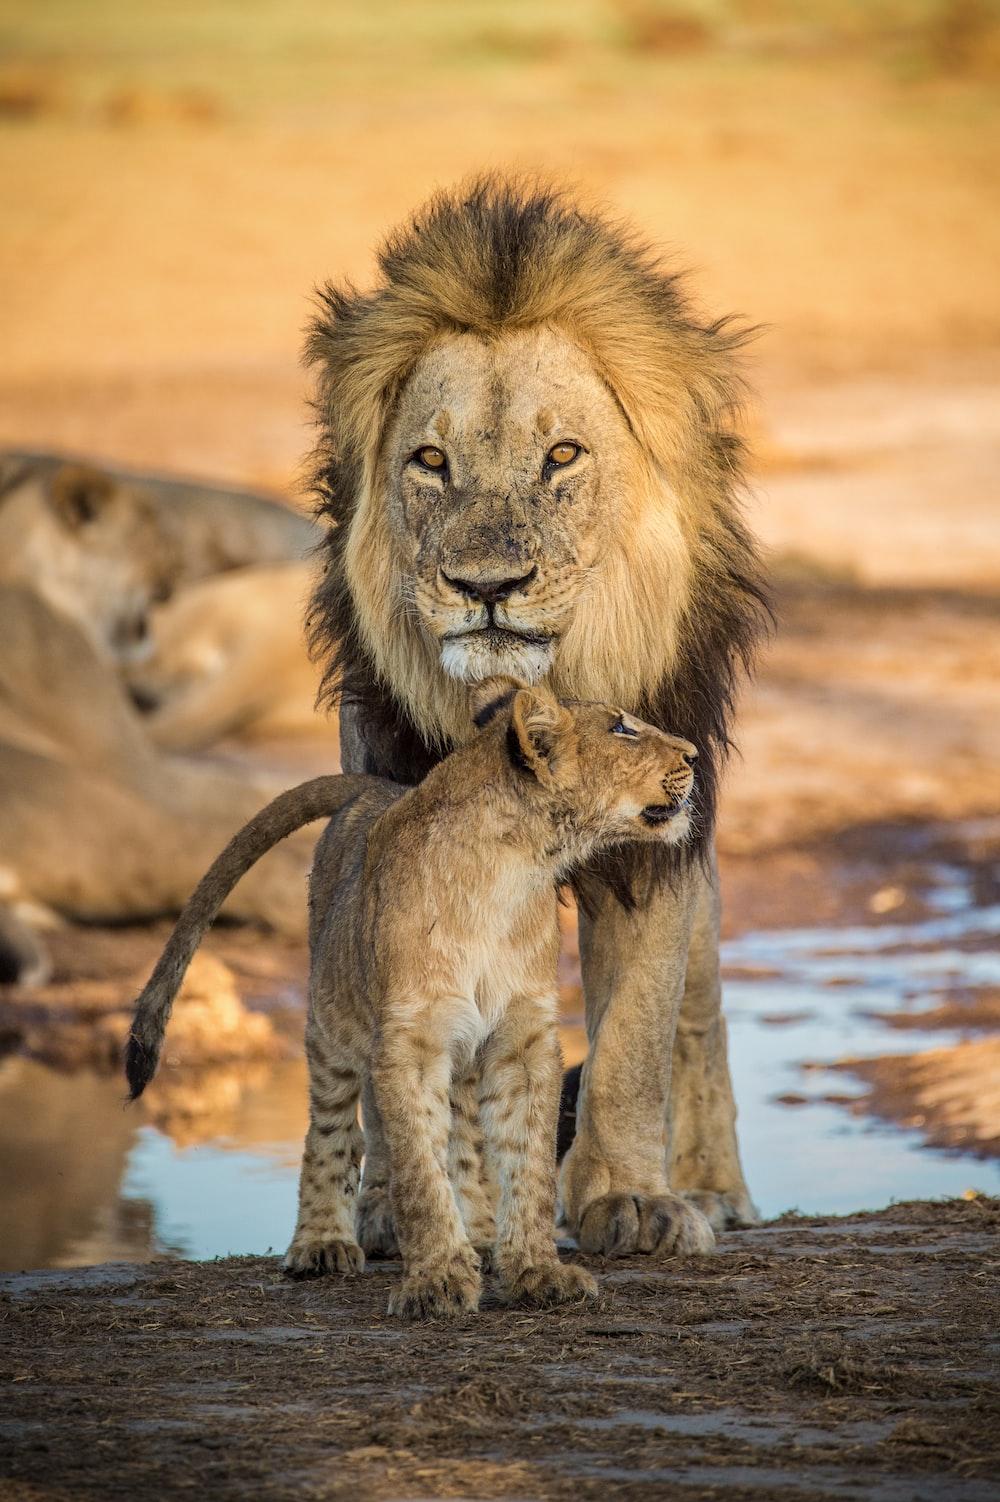 brown lion on water during daytime